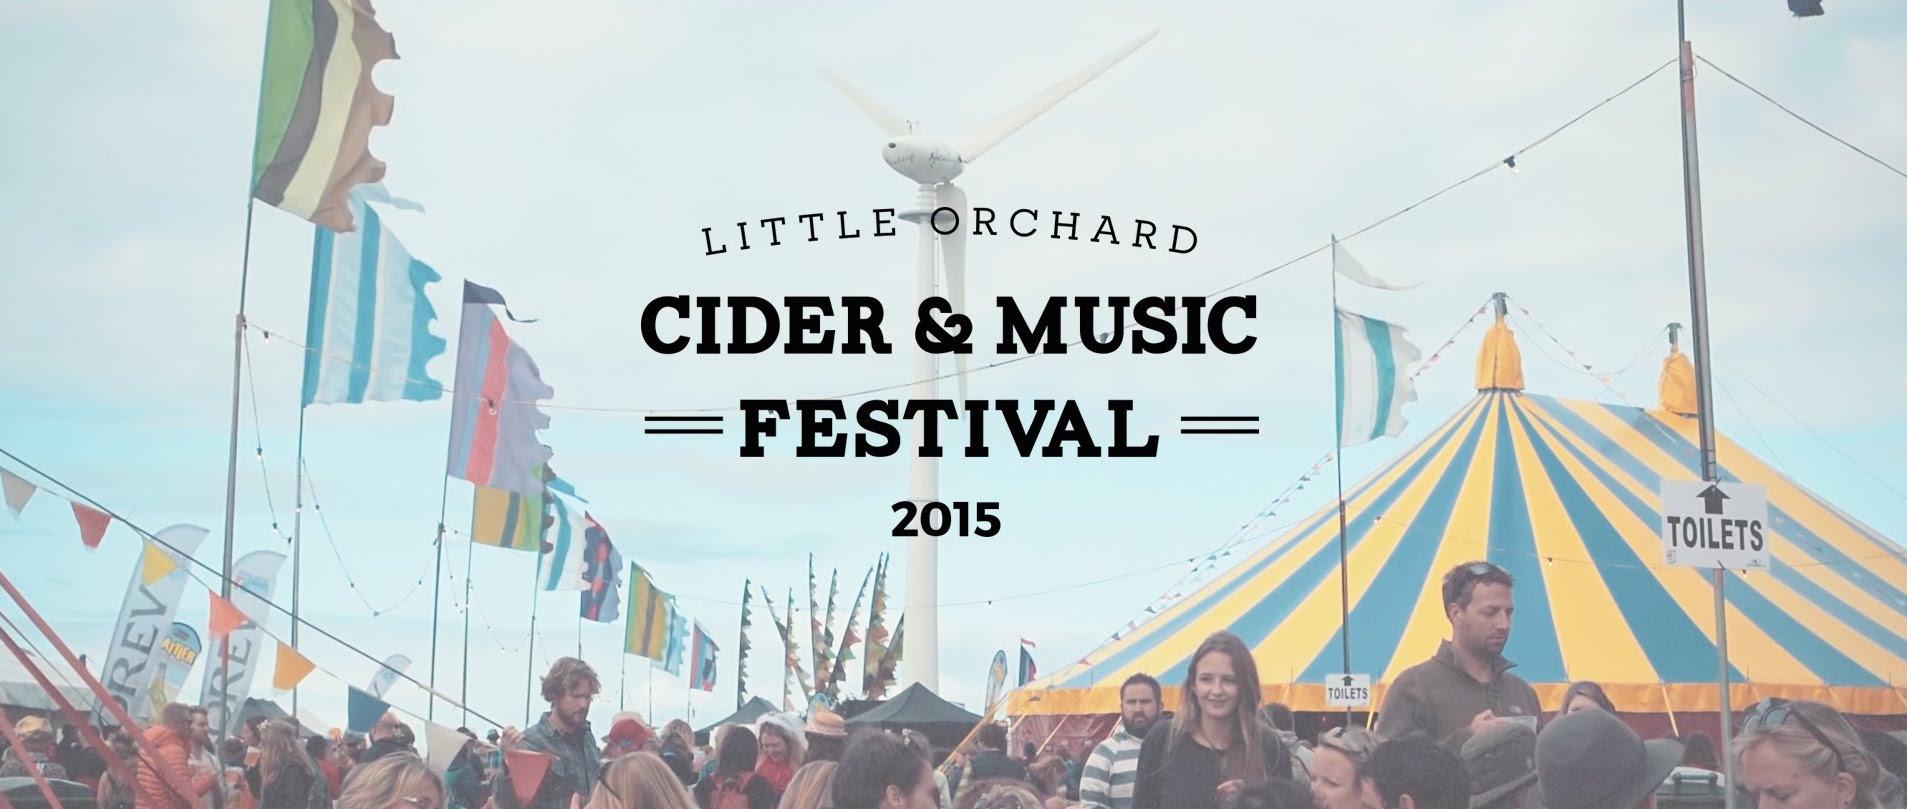 little-orchard festival